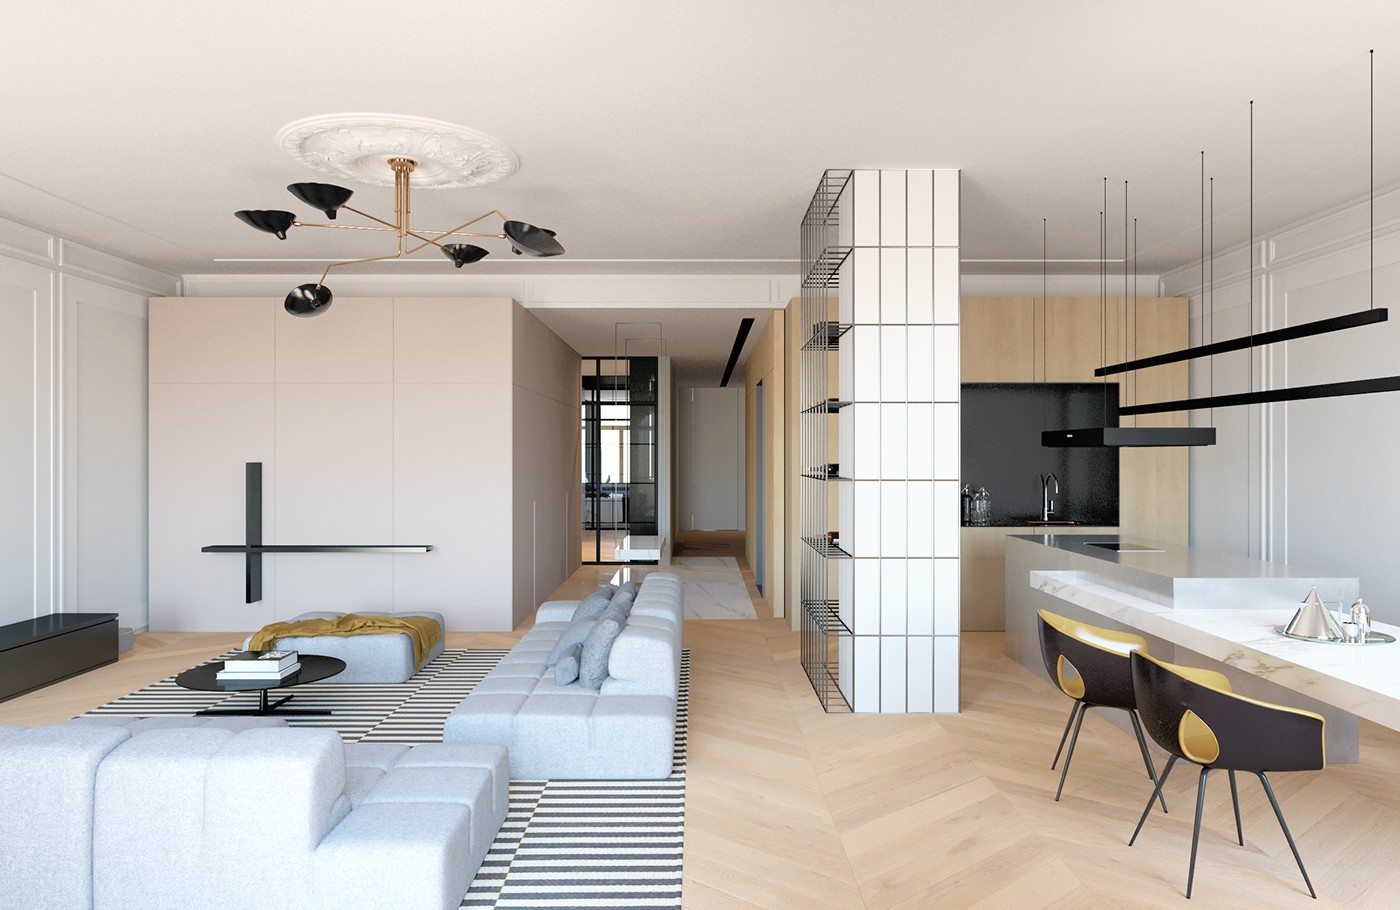 tremdy minimalist home design ideas